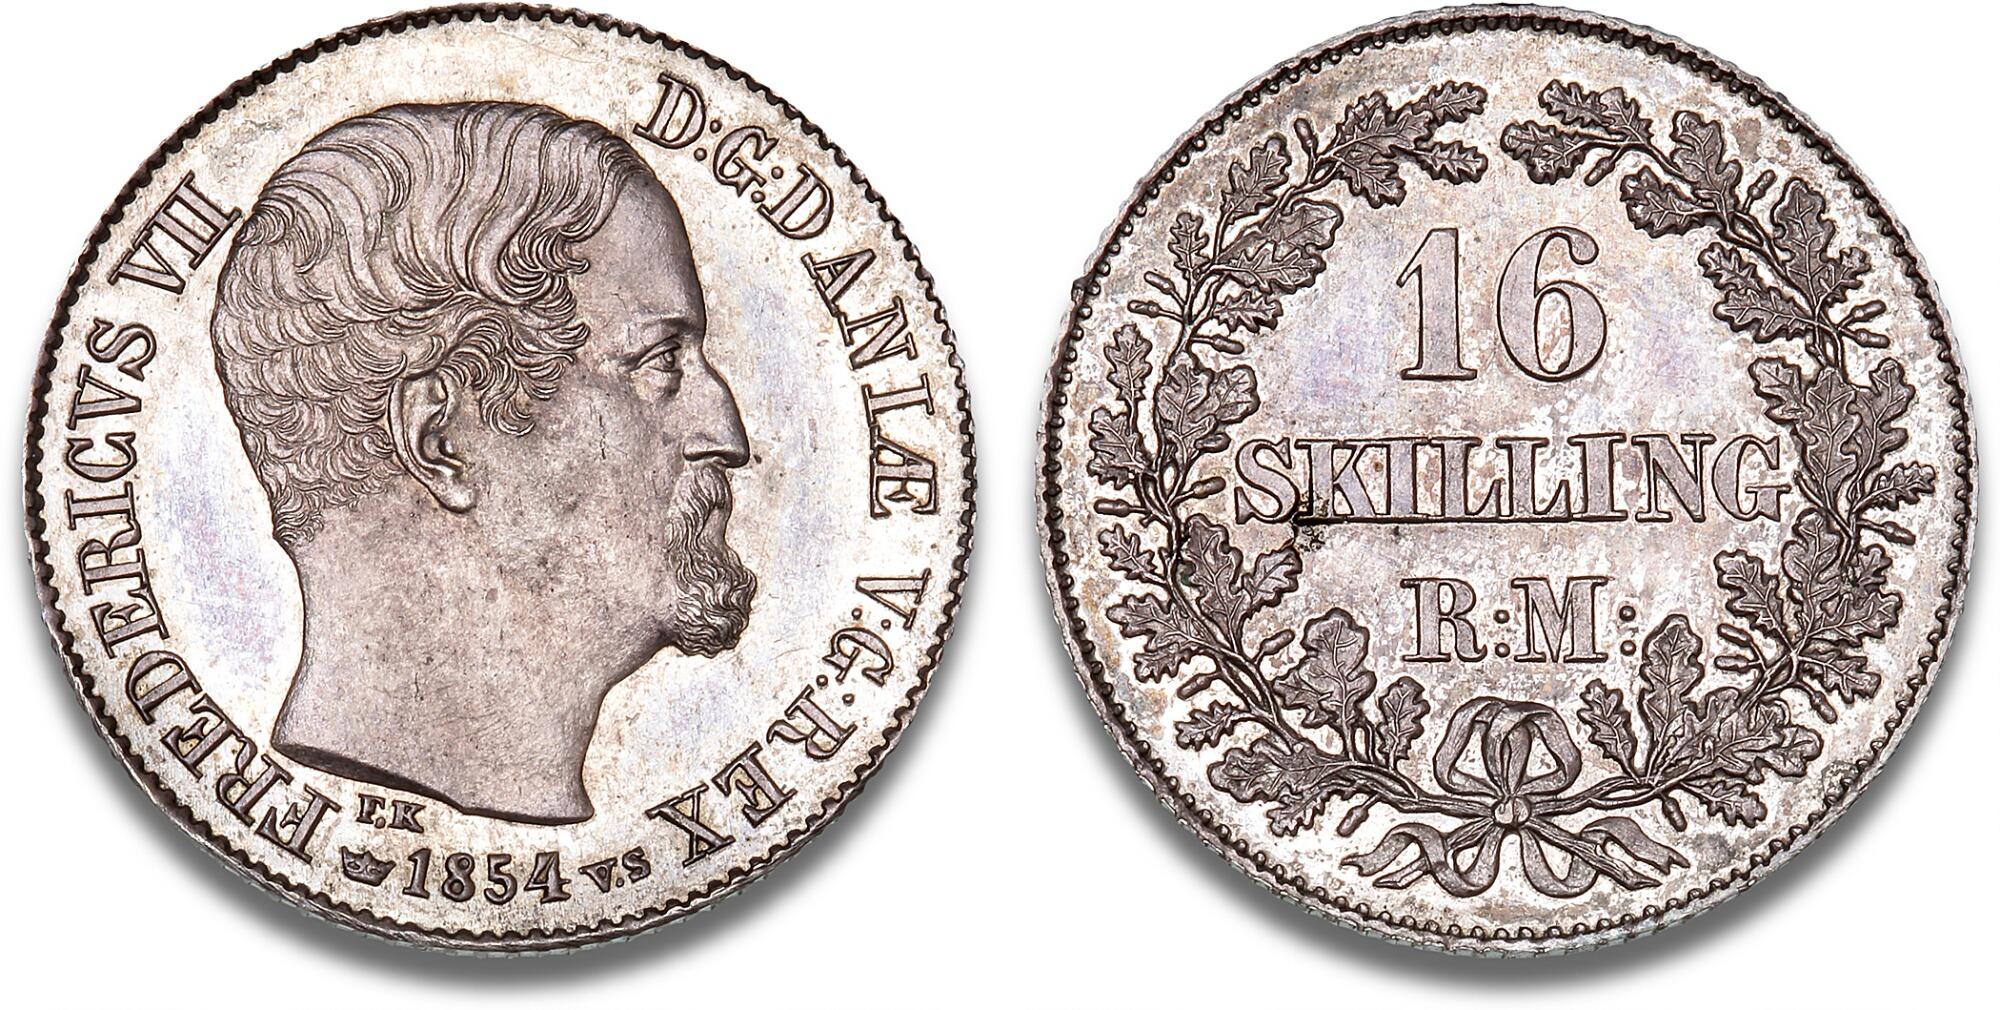 UNC Panama 1//2 Balboa Commemorative coin 2014 from Mint Roll